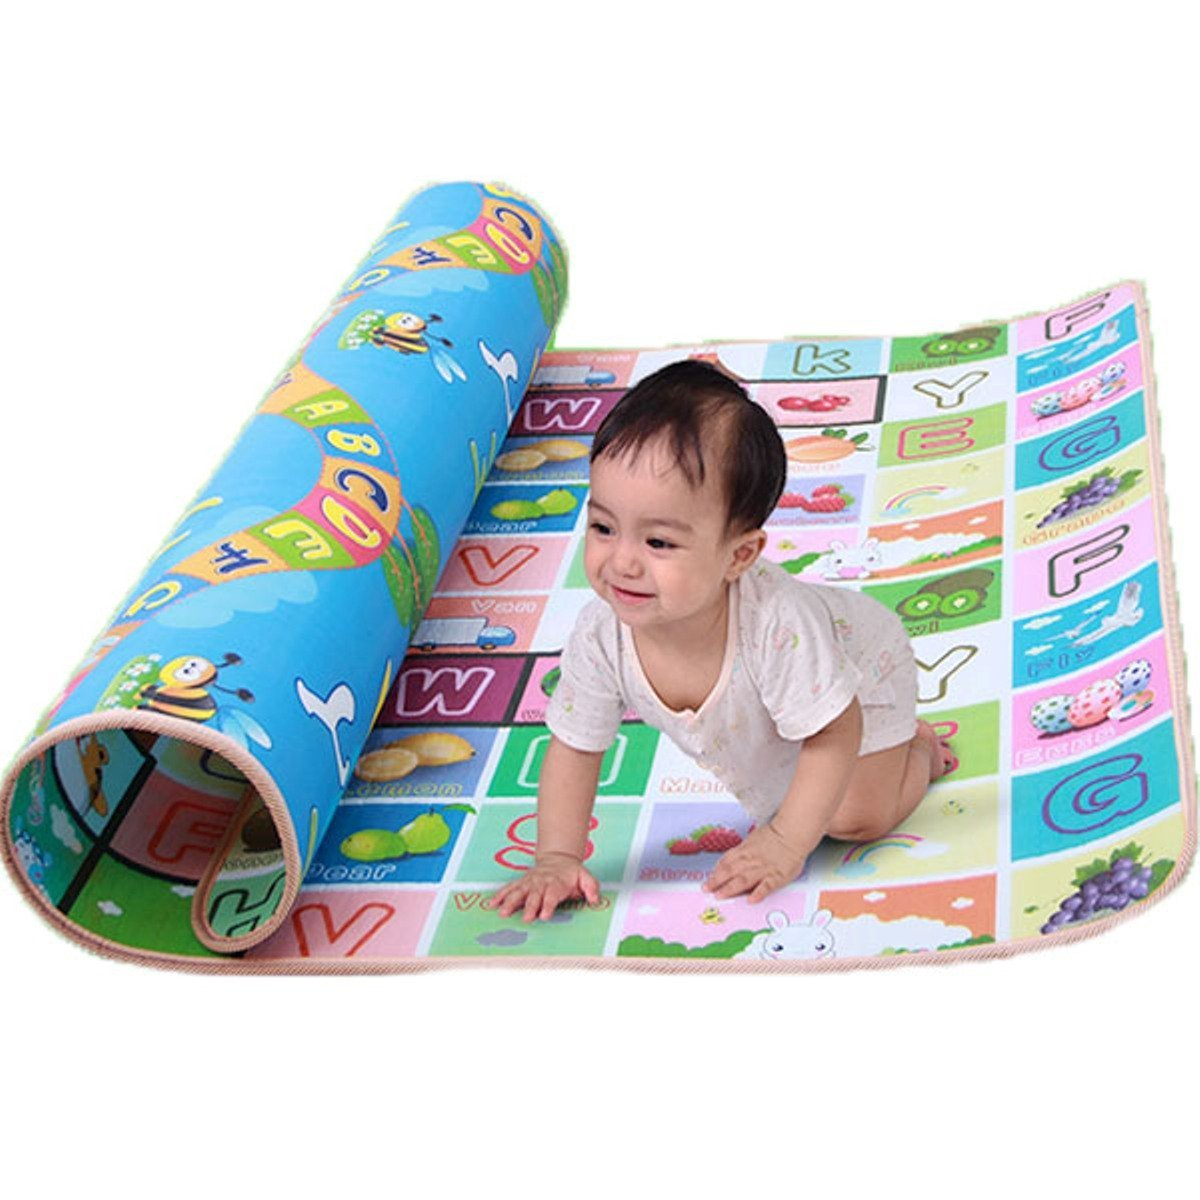 frozen nap sleeping bag item baby disney blue daycare mat kids blanket toddler itm description roll mats